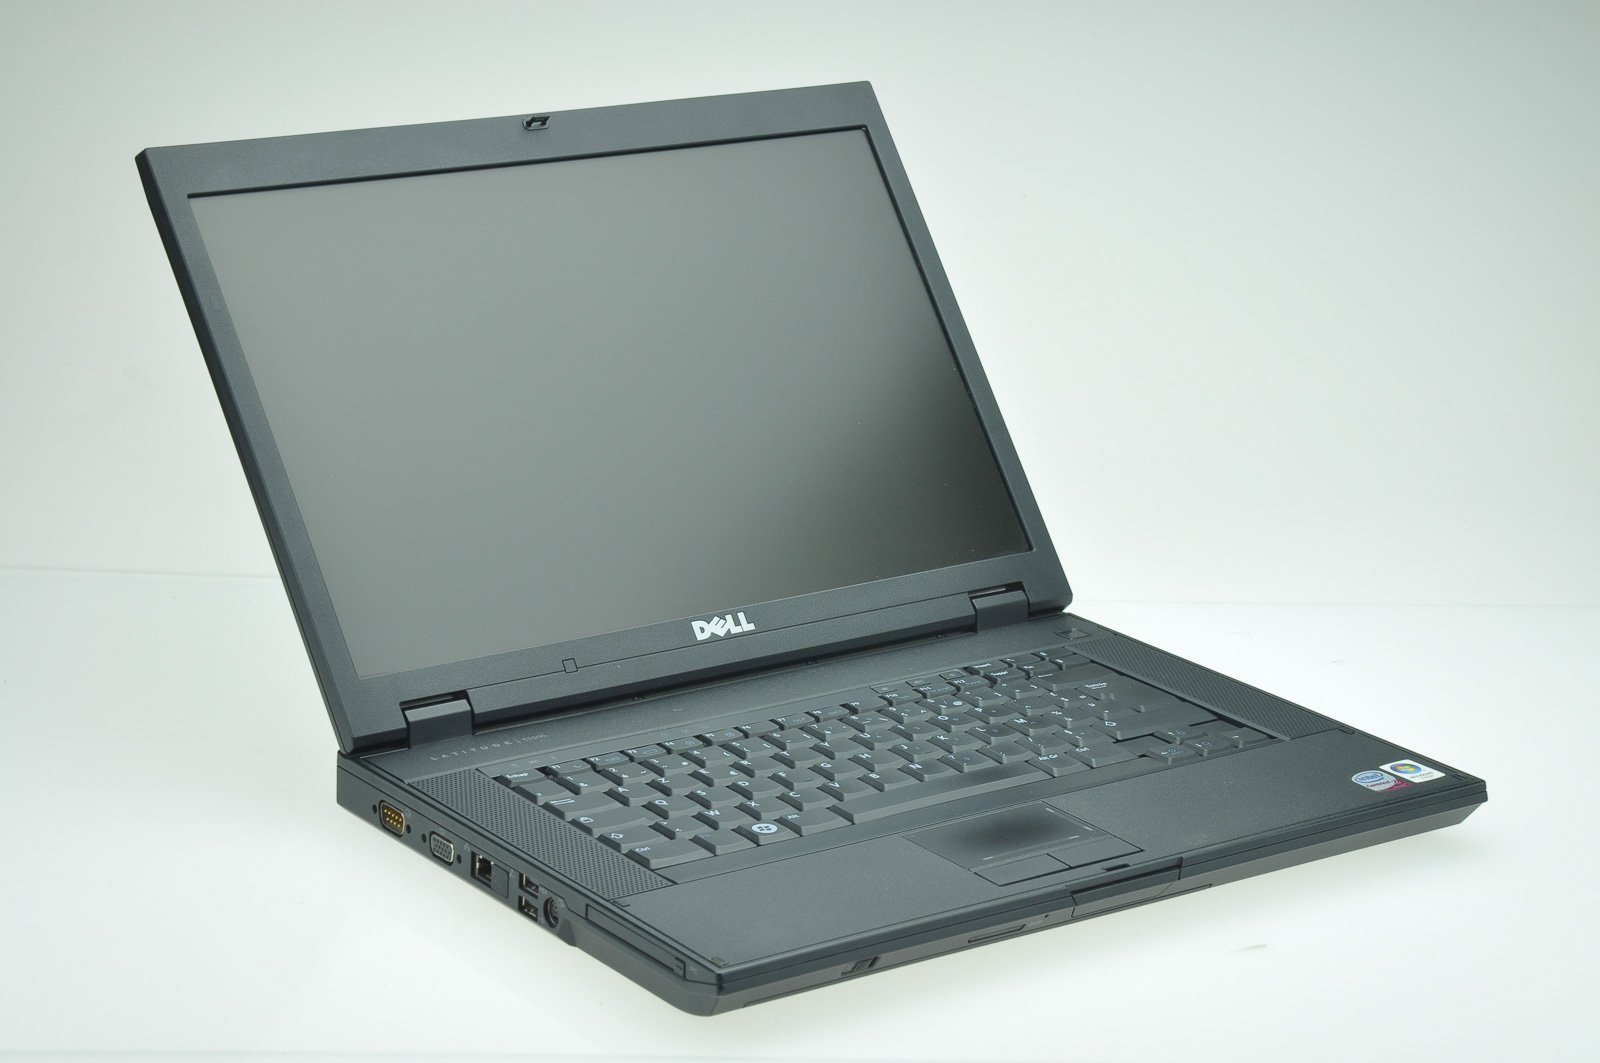 Poleasingowe Laptopy Laptop Dell Latitude E5500 P8600 2 Gb 160 Hdd